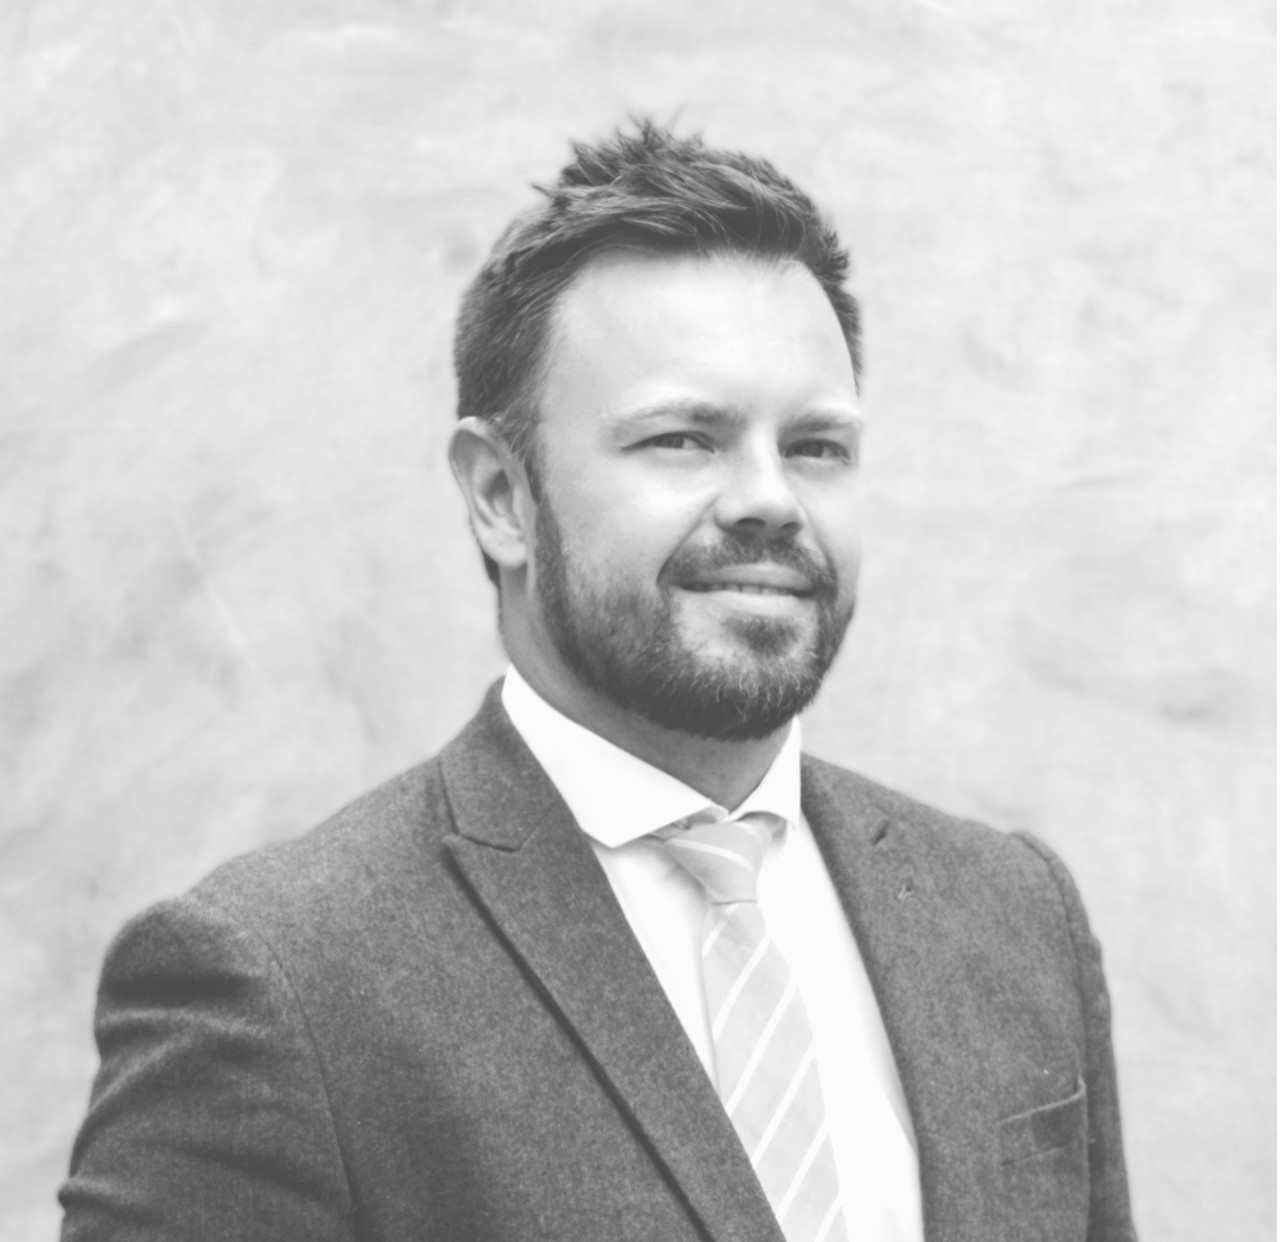 Marketing specialist Joshua Hunt